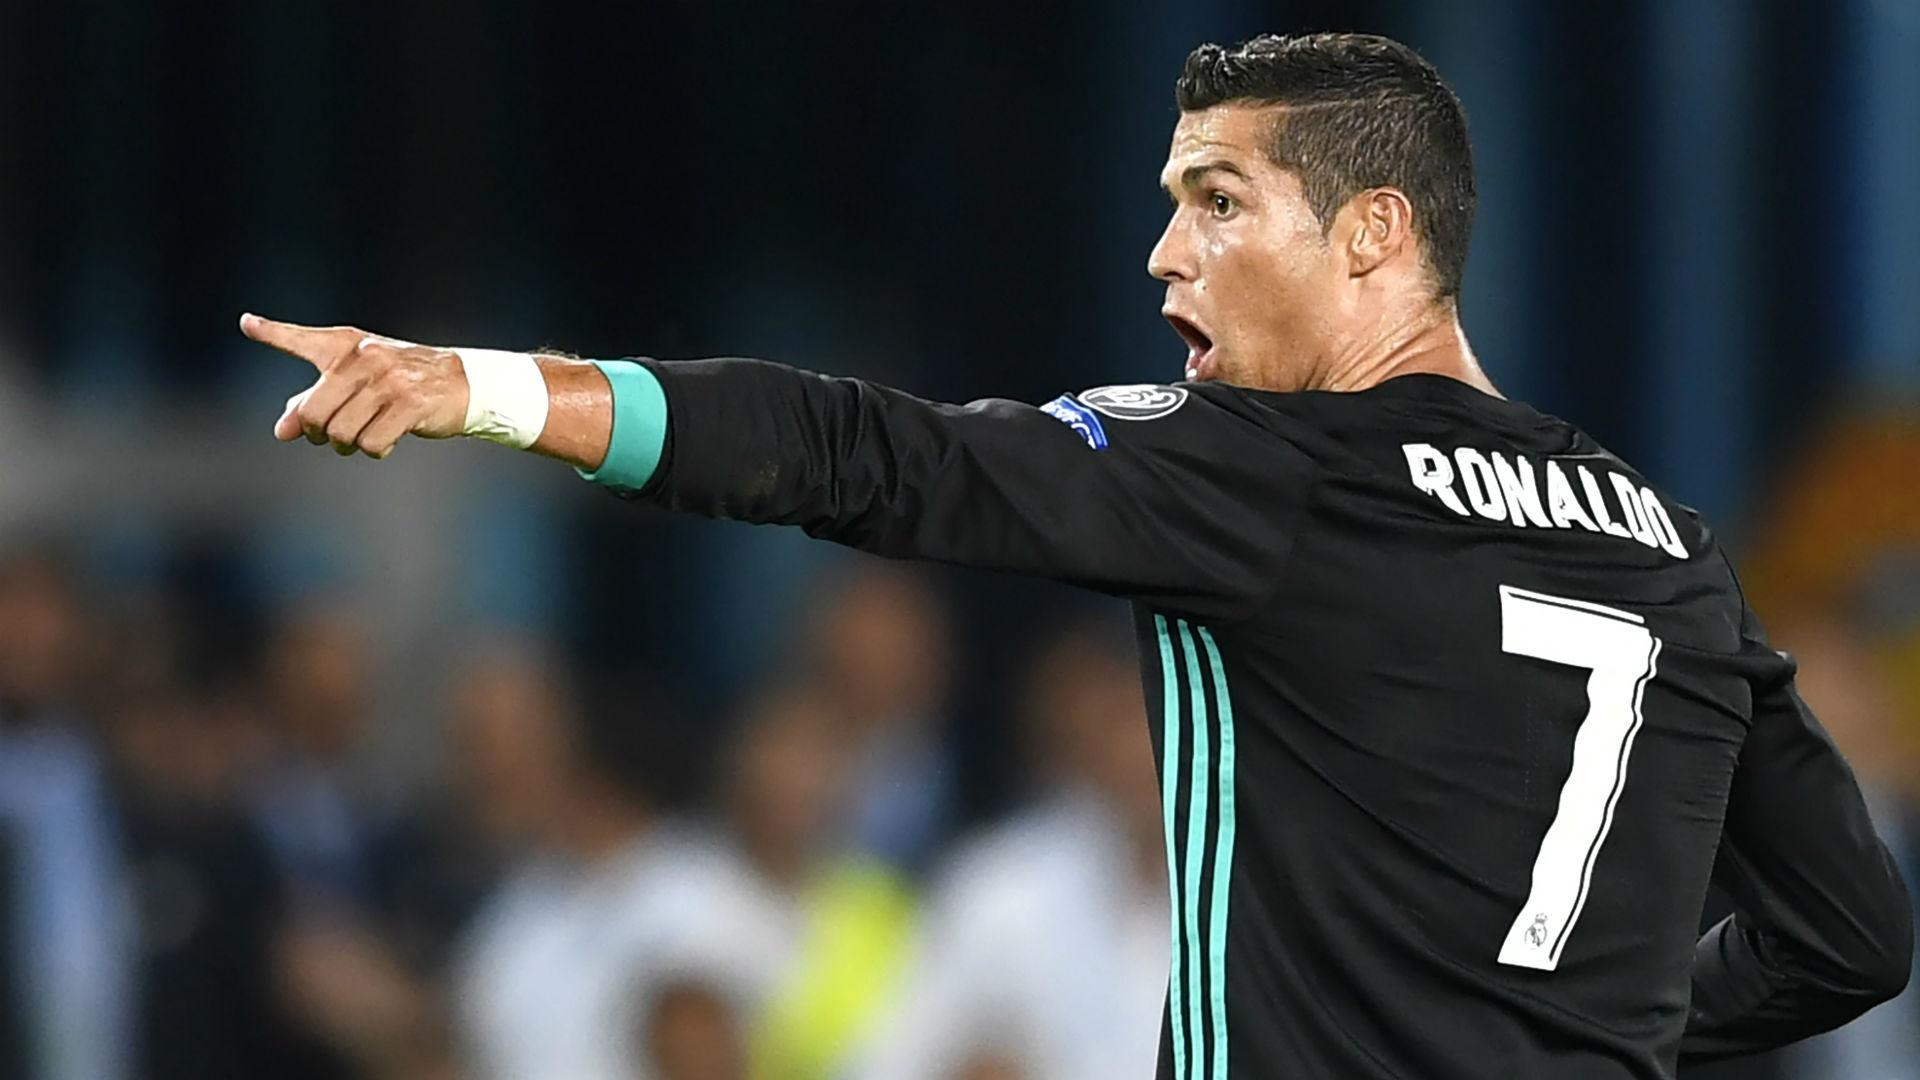 PHOTOS : FIFA World Cup 2018: Cristiano Ronaldo hat-trick C ronaldo pictures 2018